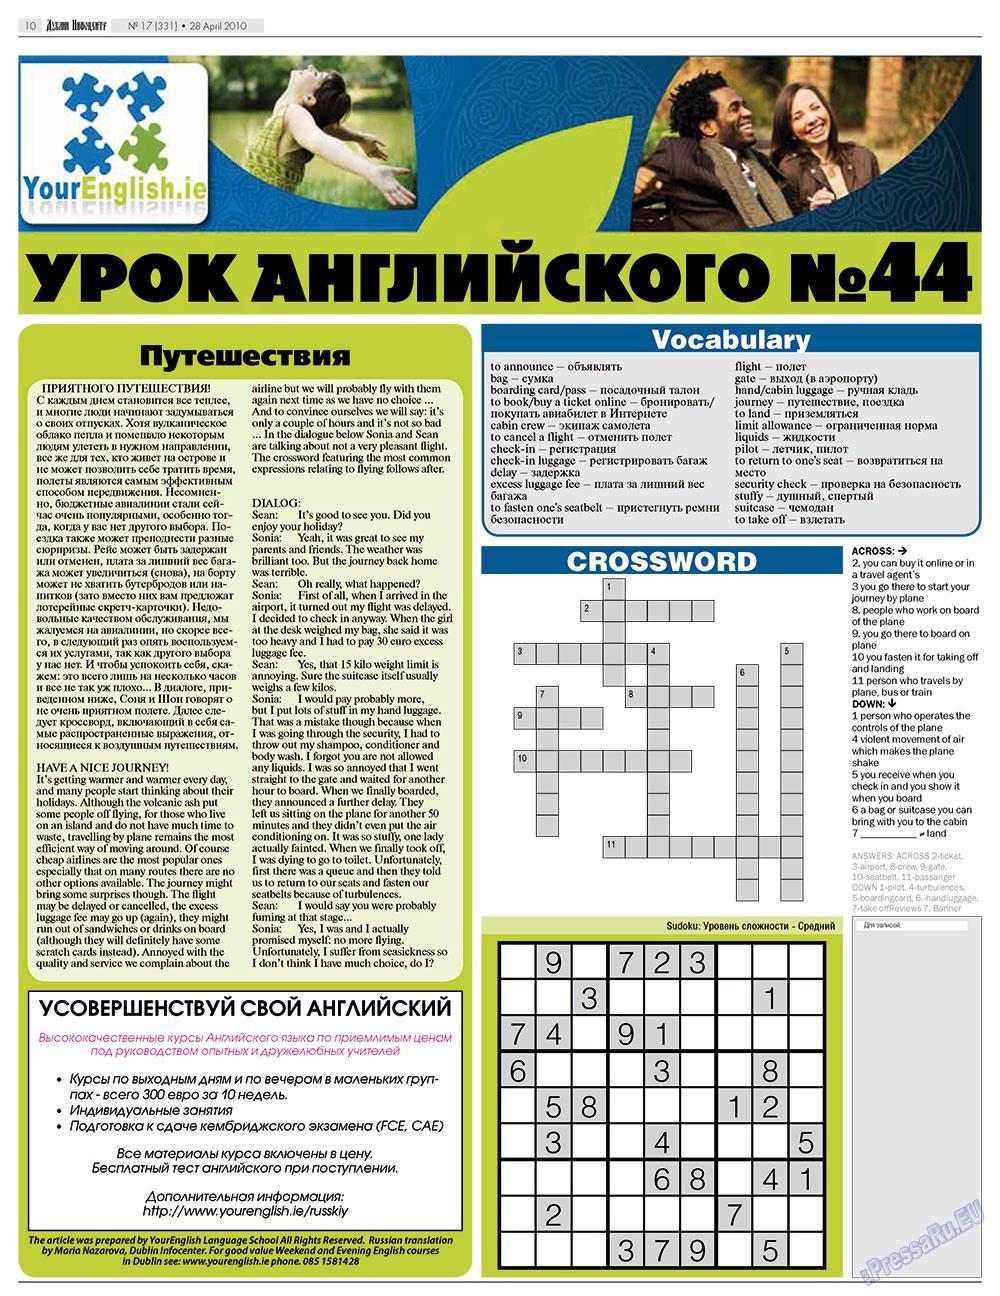 Дублин инфоцентр (газета). 2010 год, номер 17, стр. 10